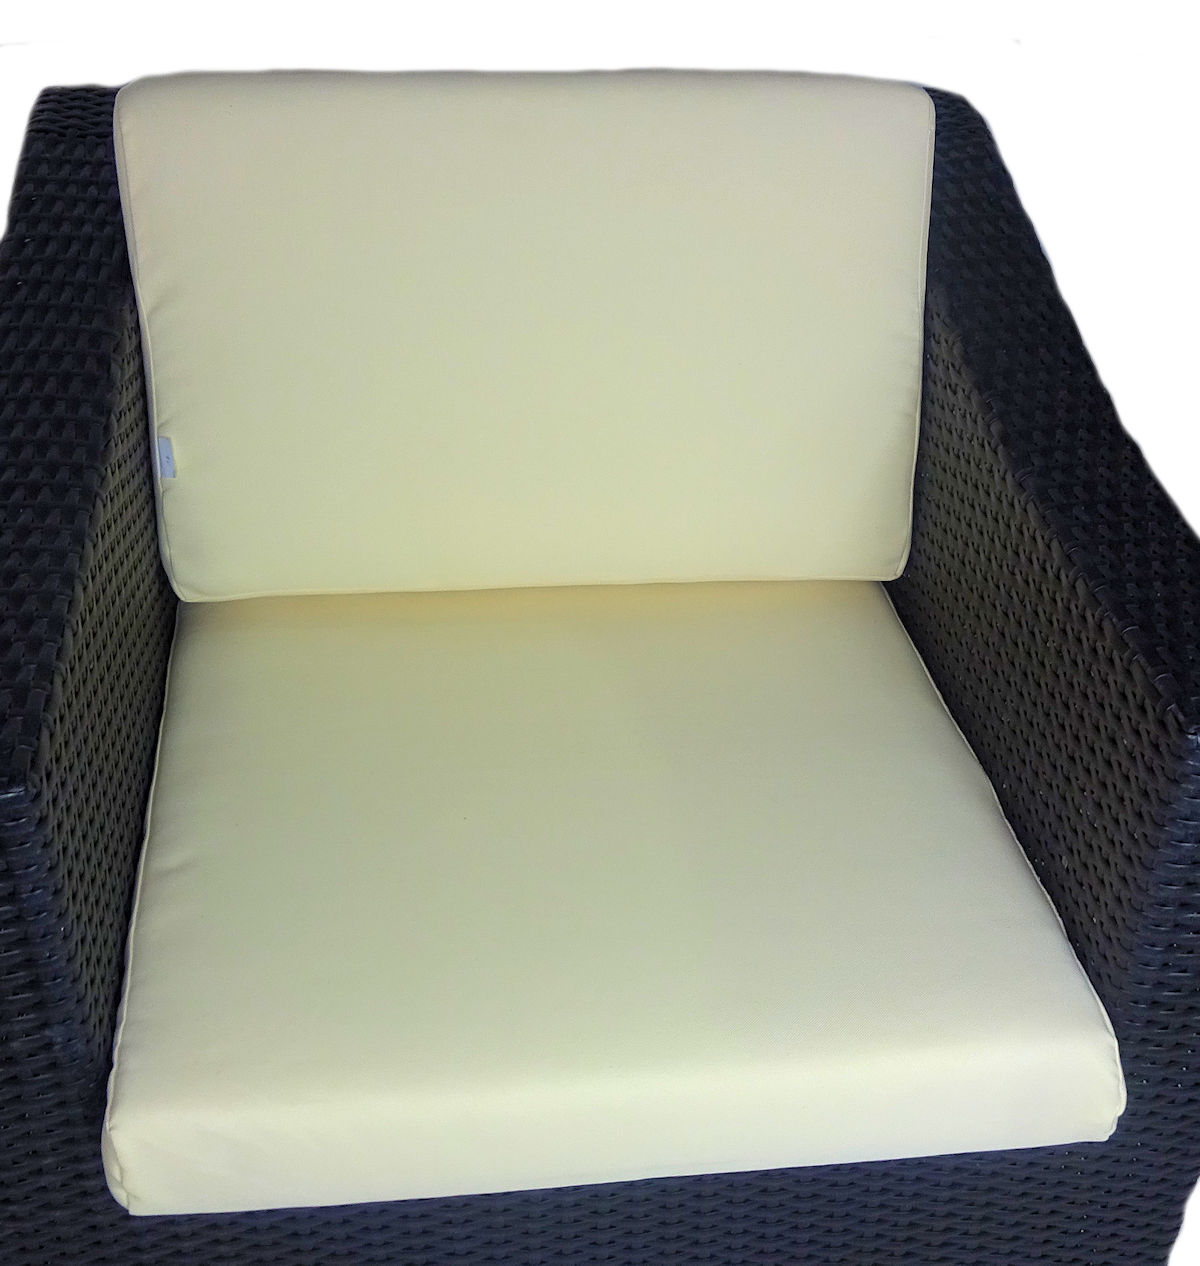 kissen polster f r pe rattanm bel san remo set sitz r cken stoff 416. Black Bedroom Furniture Sets. Home Design Ideas